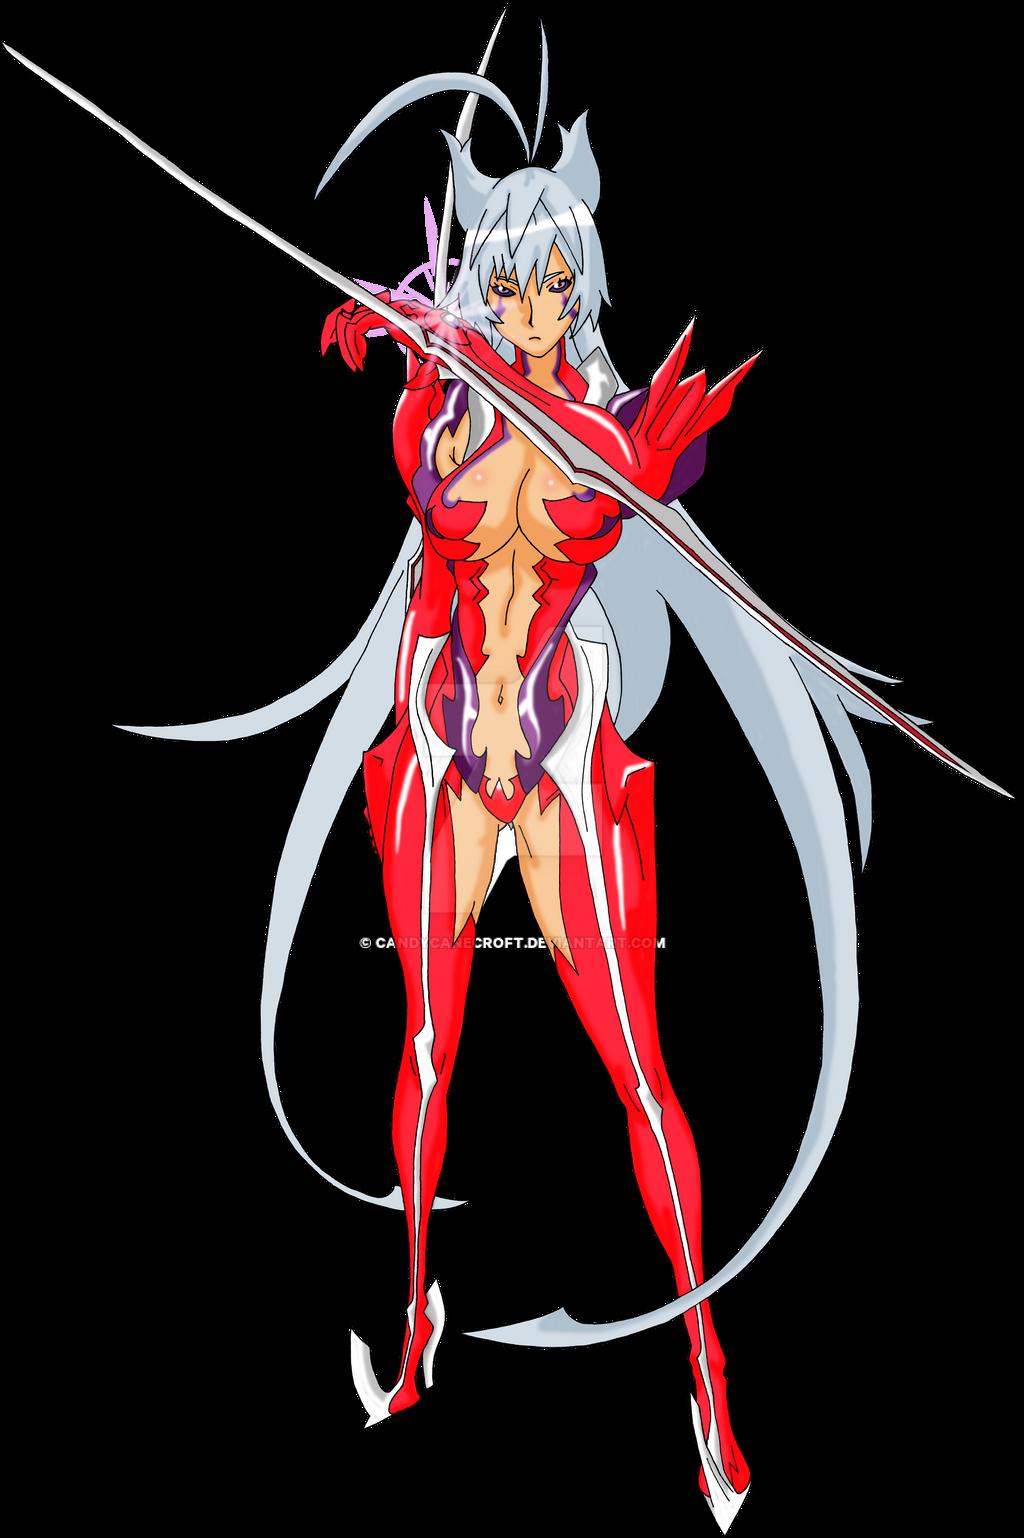 Masane Amaha Render [Witchblade] by Princess-of-Thorn on DeviantArt